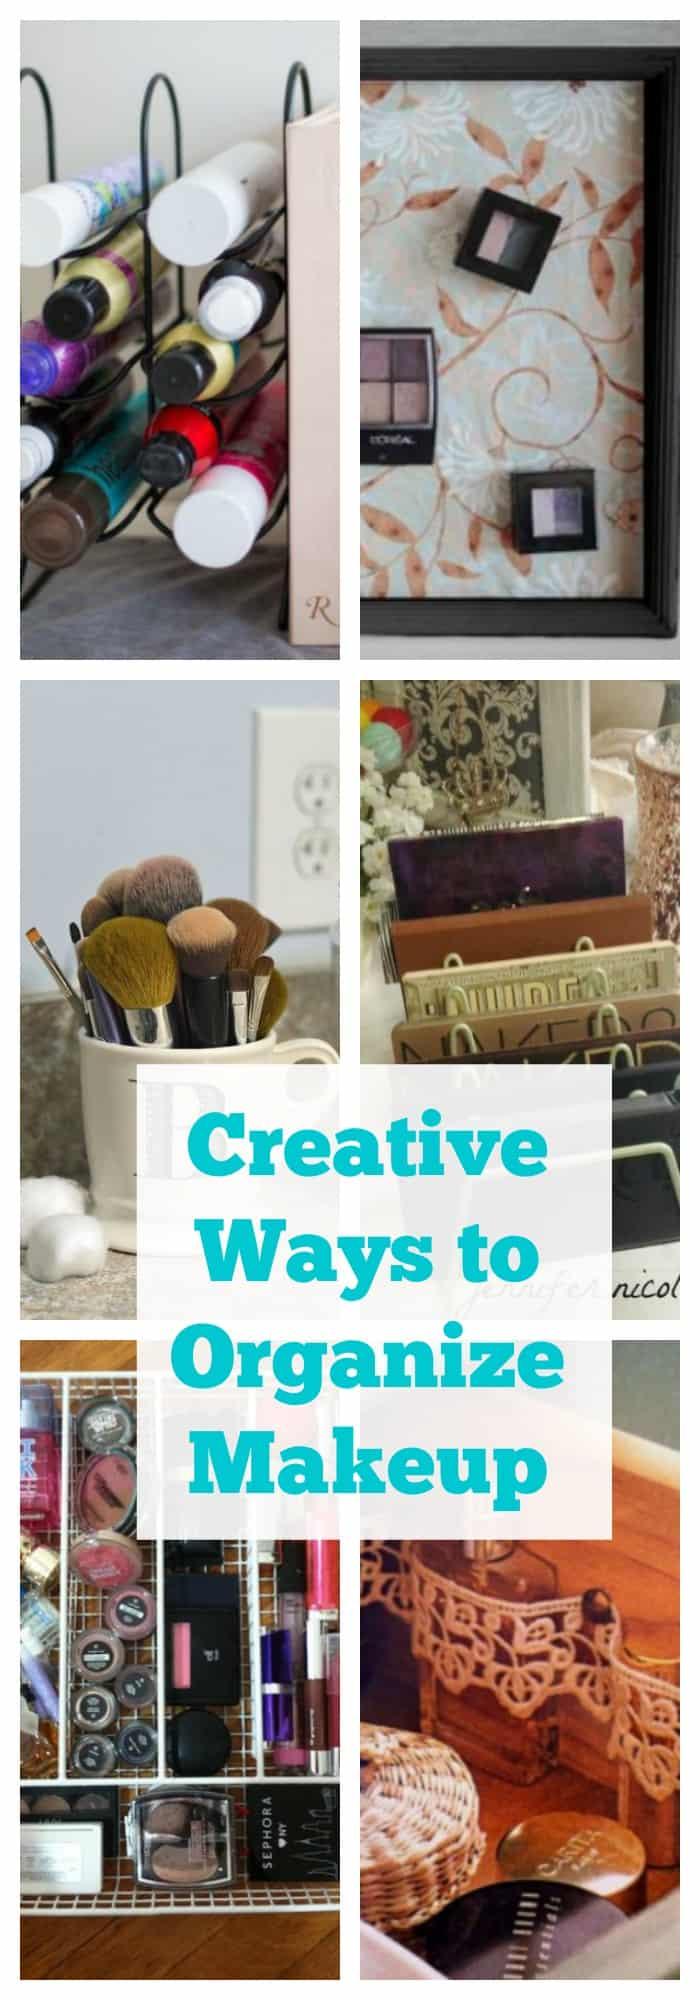 creative-ways-to-organize-makeup-for-organized-mom